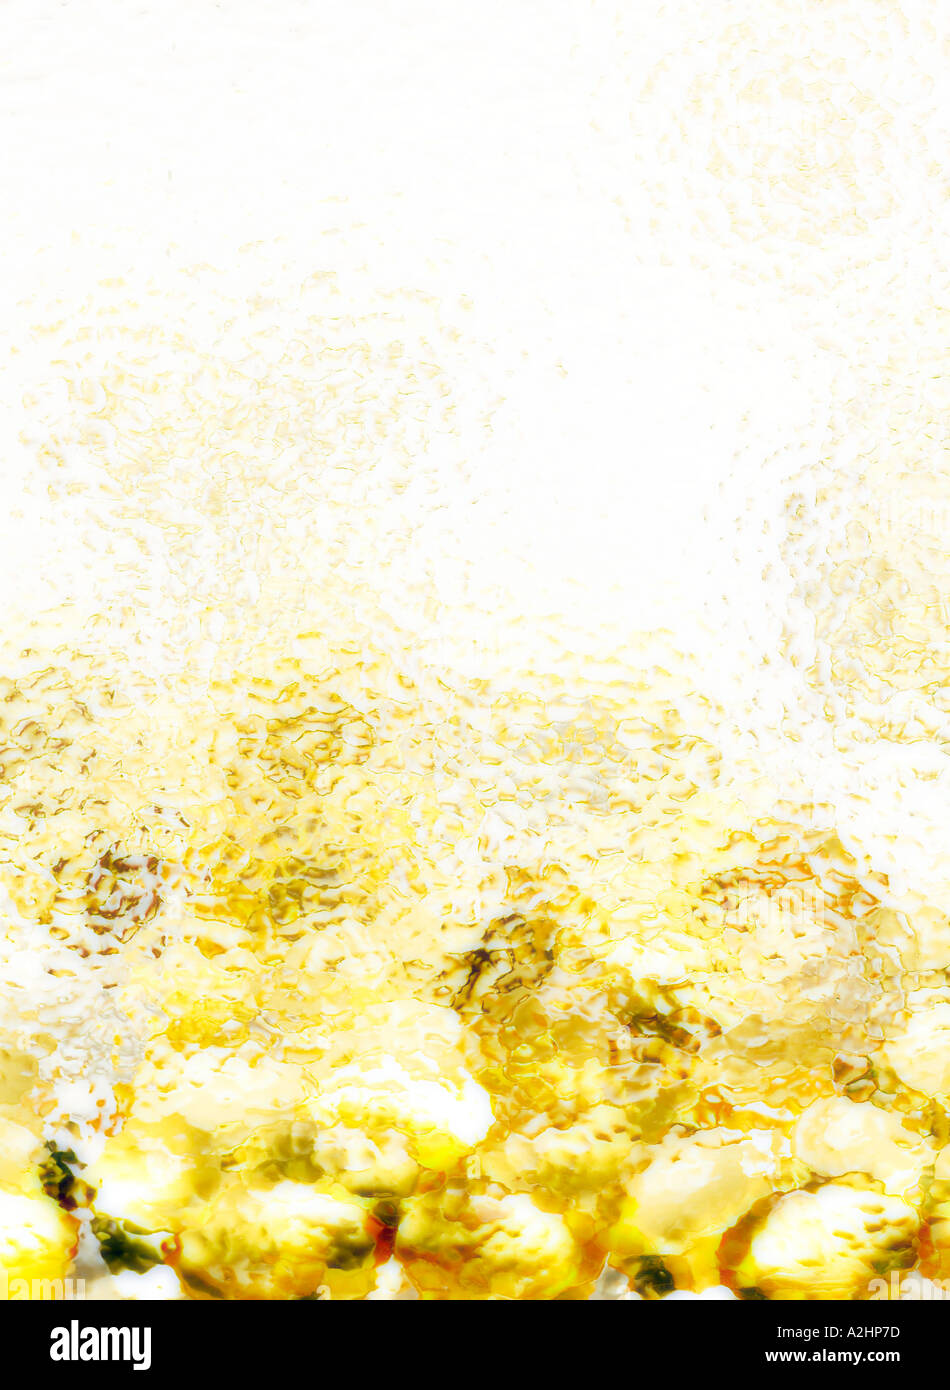 Portrait shot of cod liver oil capsules shot through textured glass - Stock Image